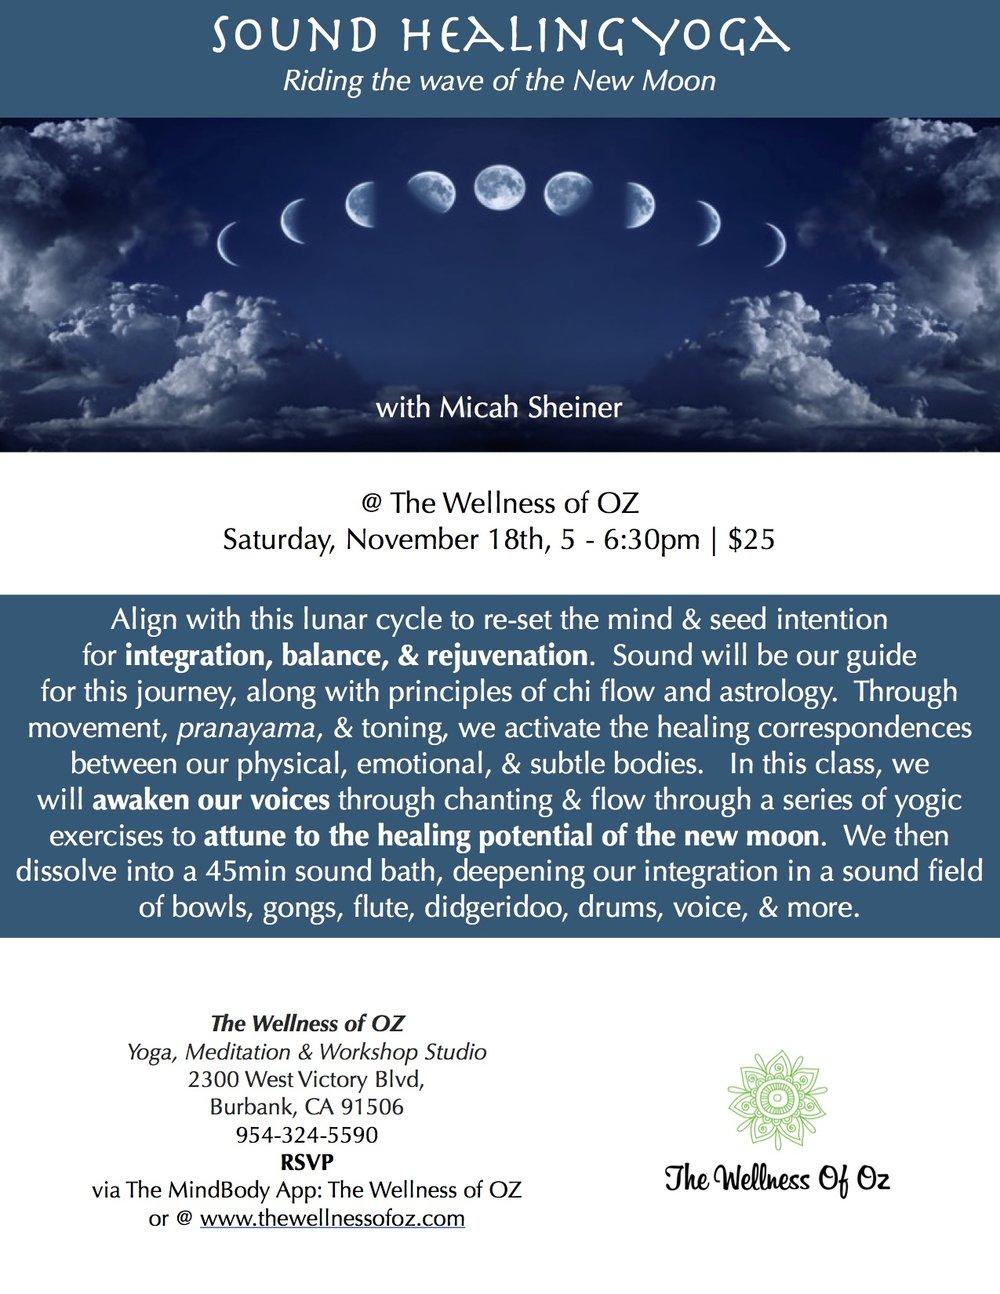 sound healing yoga new moon.jpg